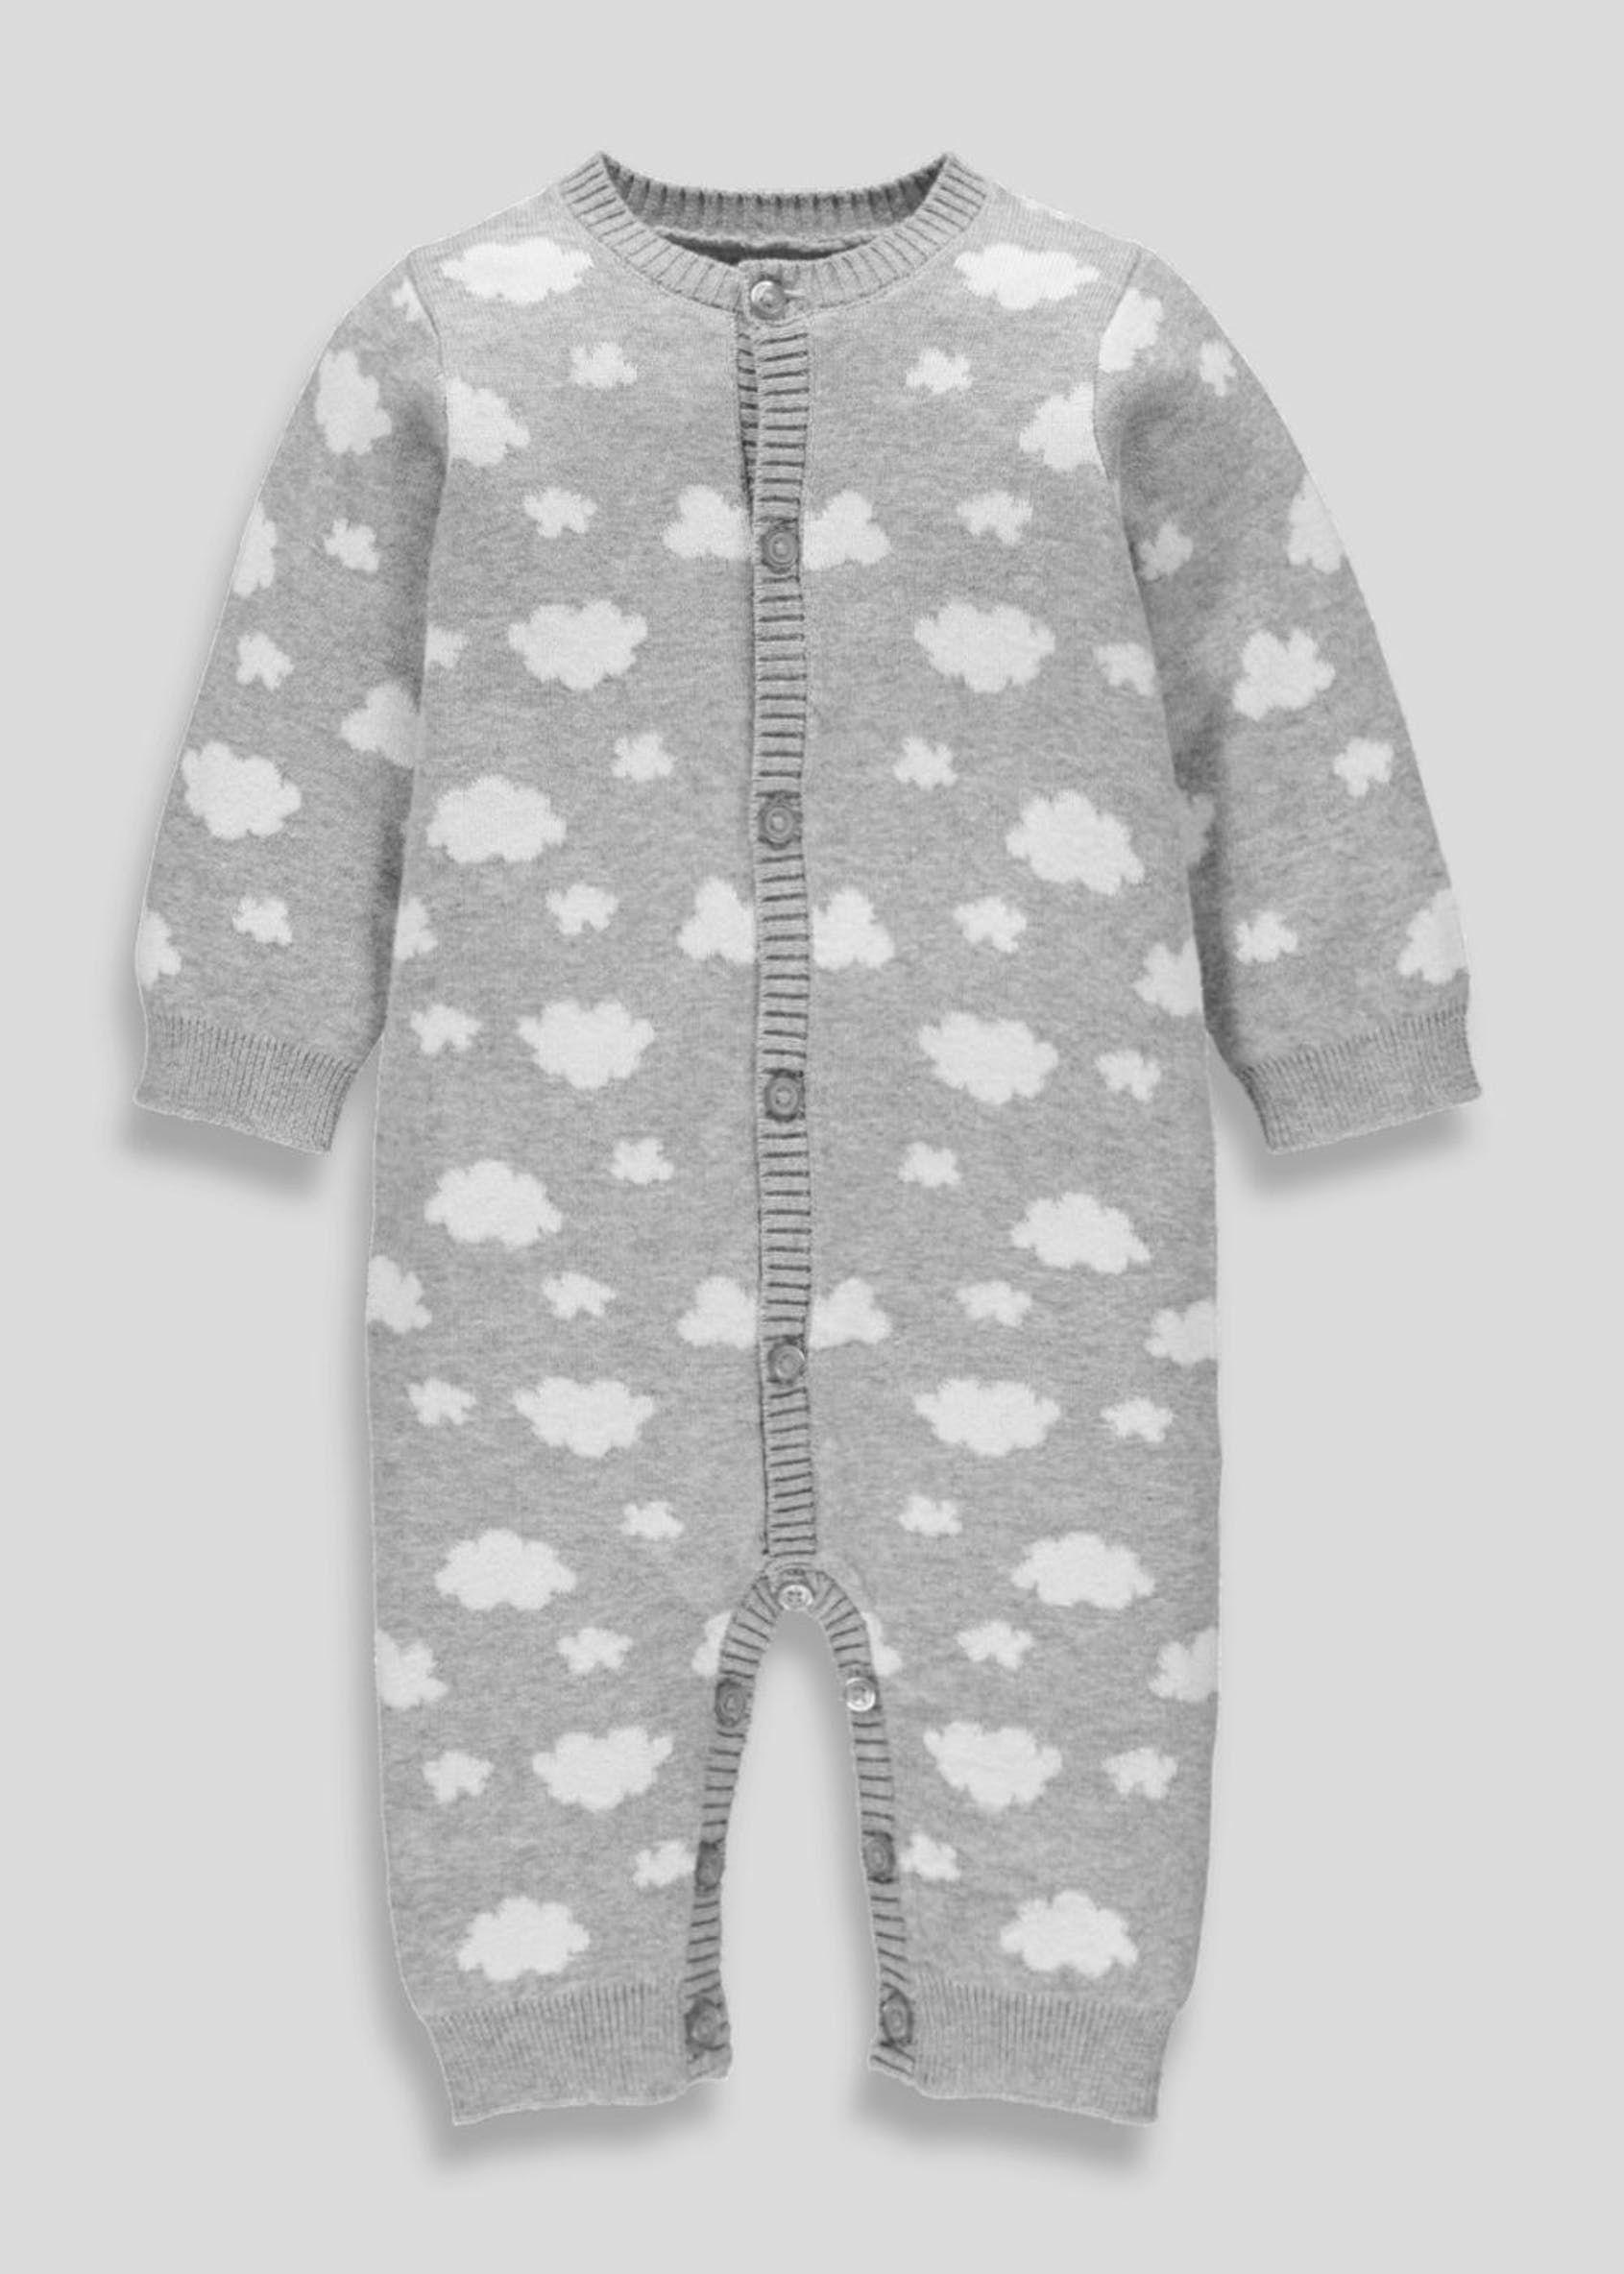 Newborn Outfits 7c83156cb1